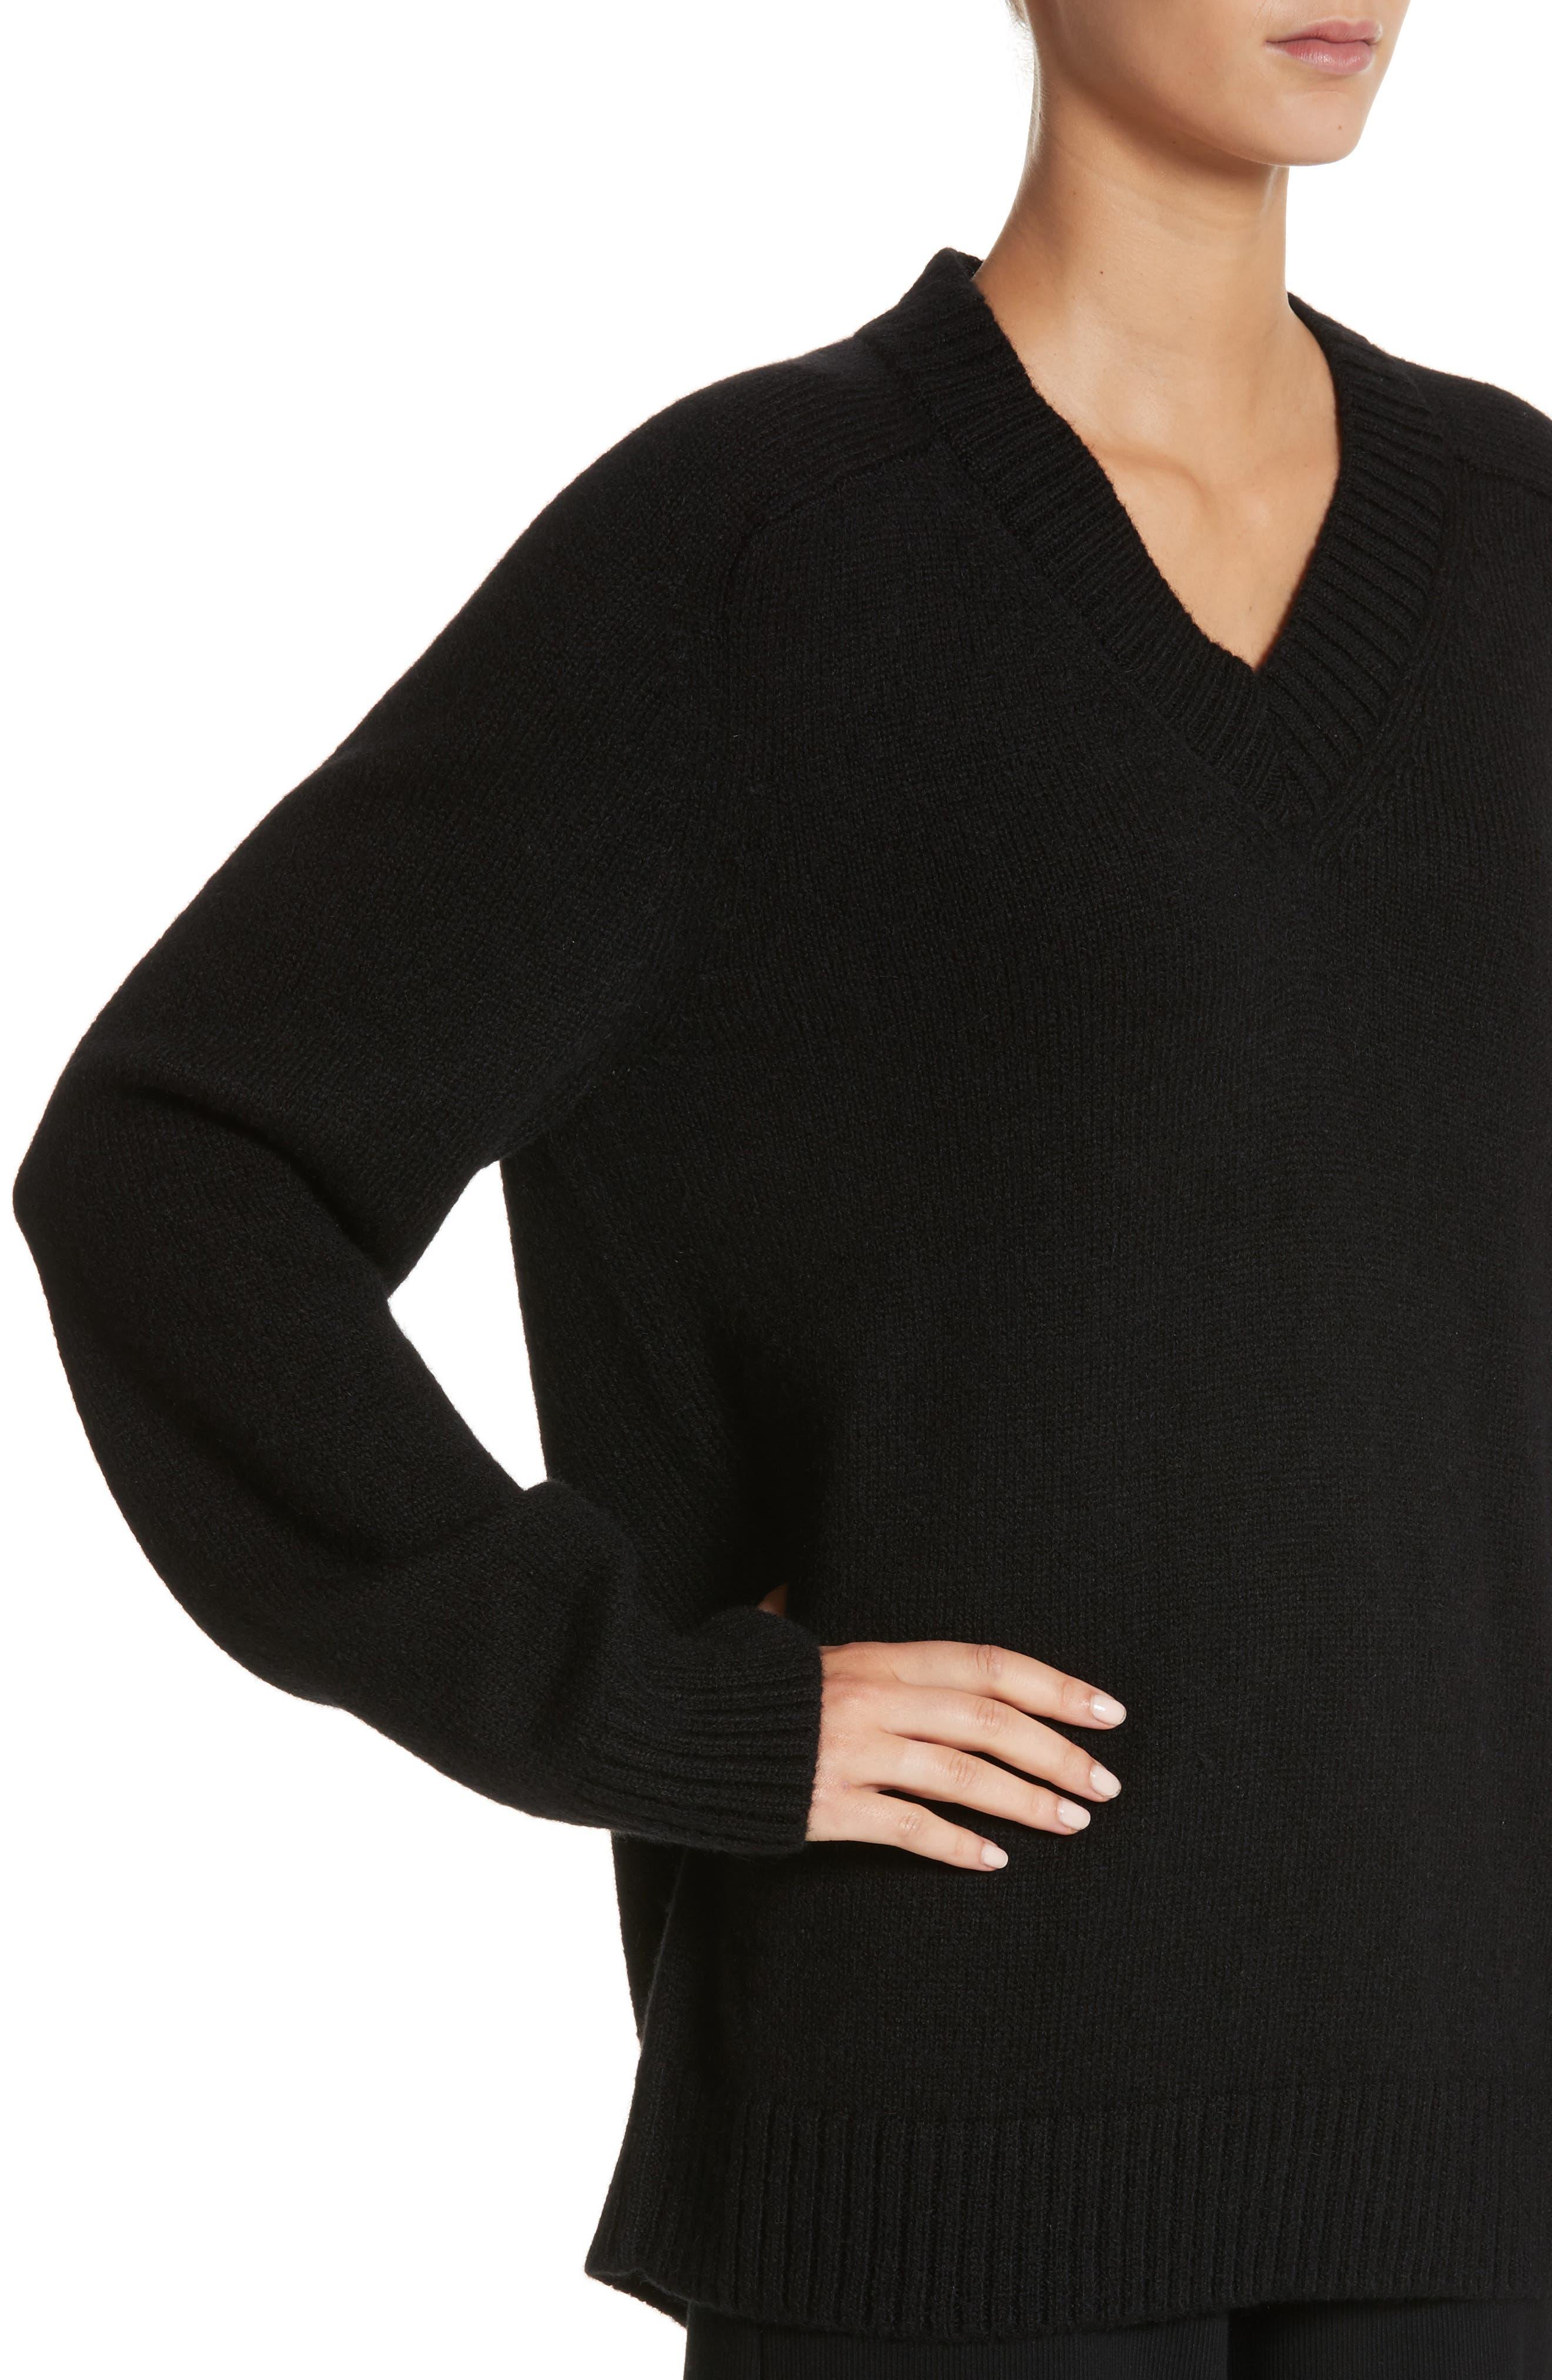 Alpaca Blend V-Neck Sweater,                             Alternate thumbnail 4, color,                             Black